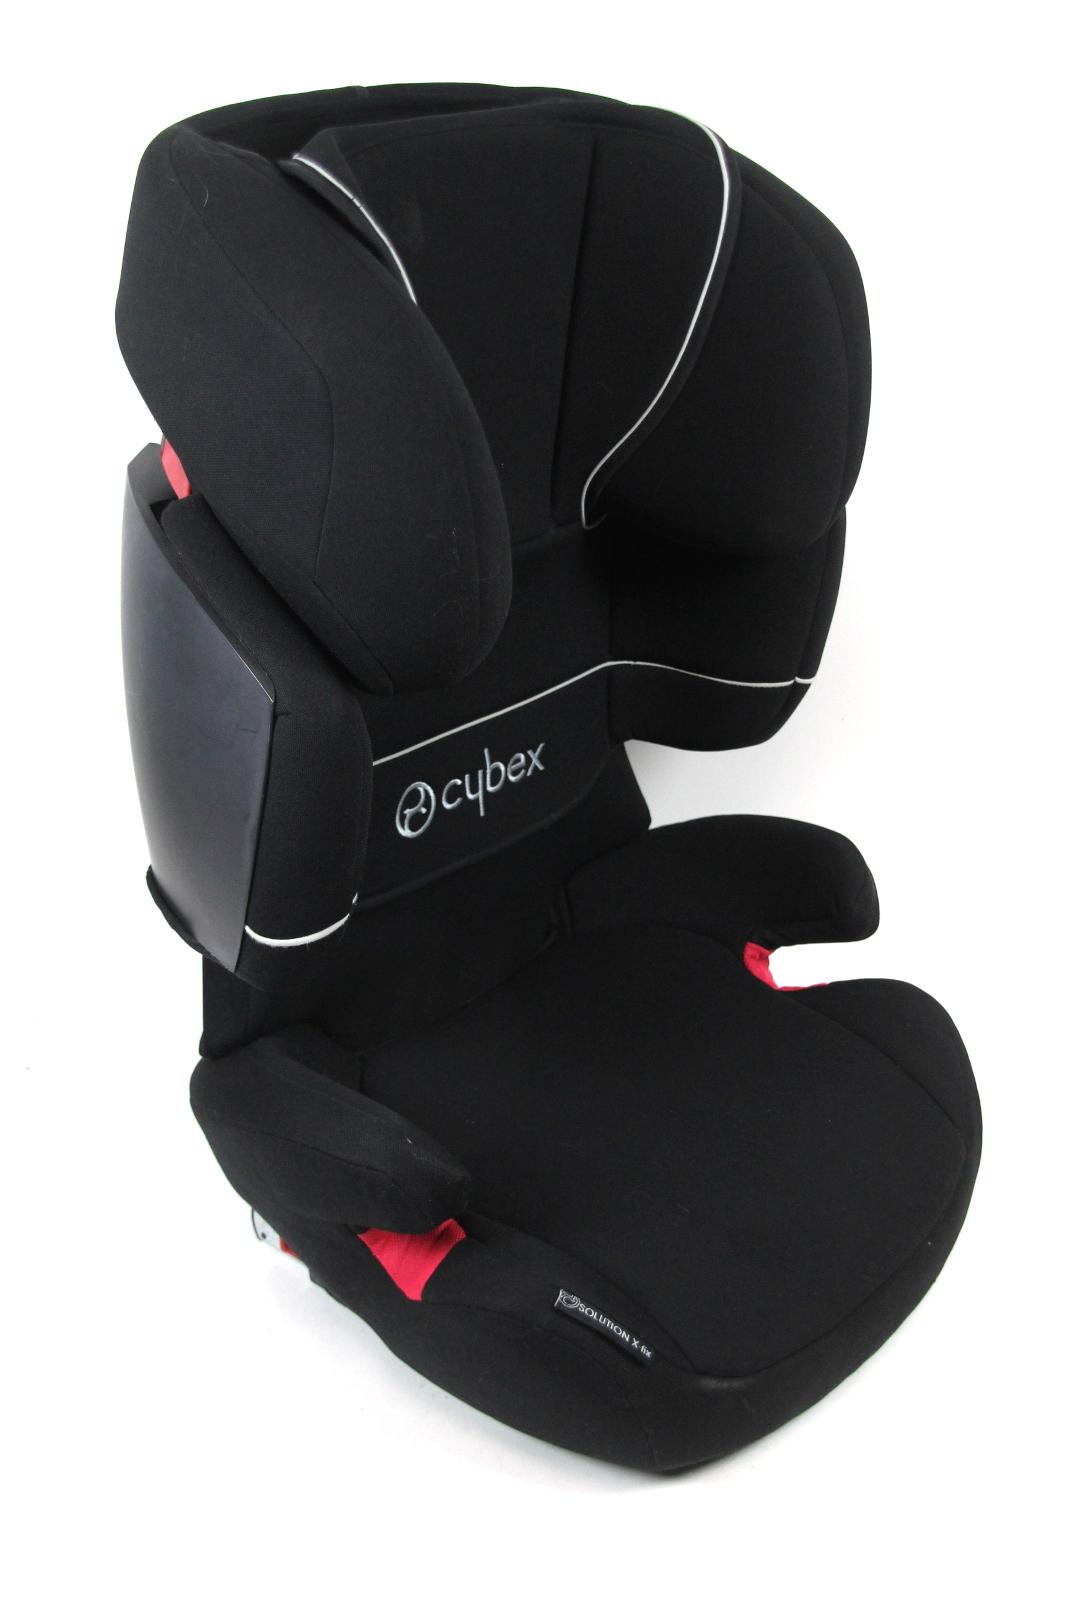 universal auto kinder sitz cybex solution x fix 15 36kg. Black Bedroom Furniture Sets. Home Design Ideas